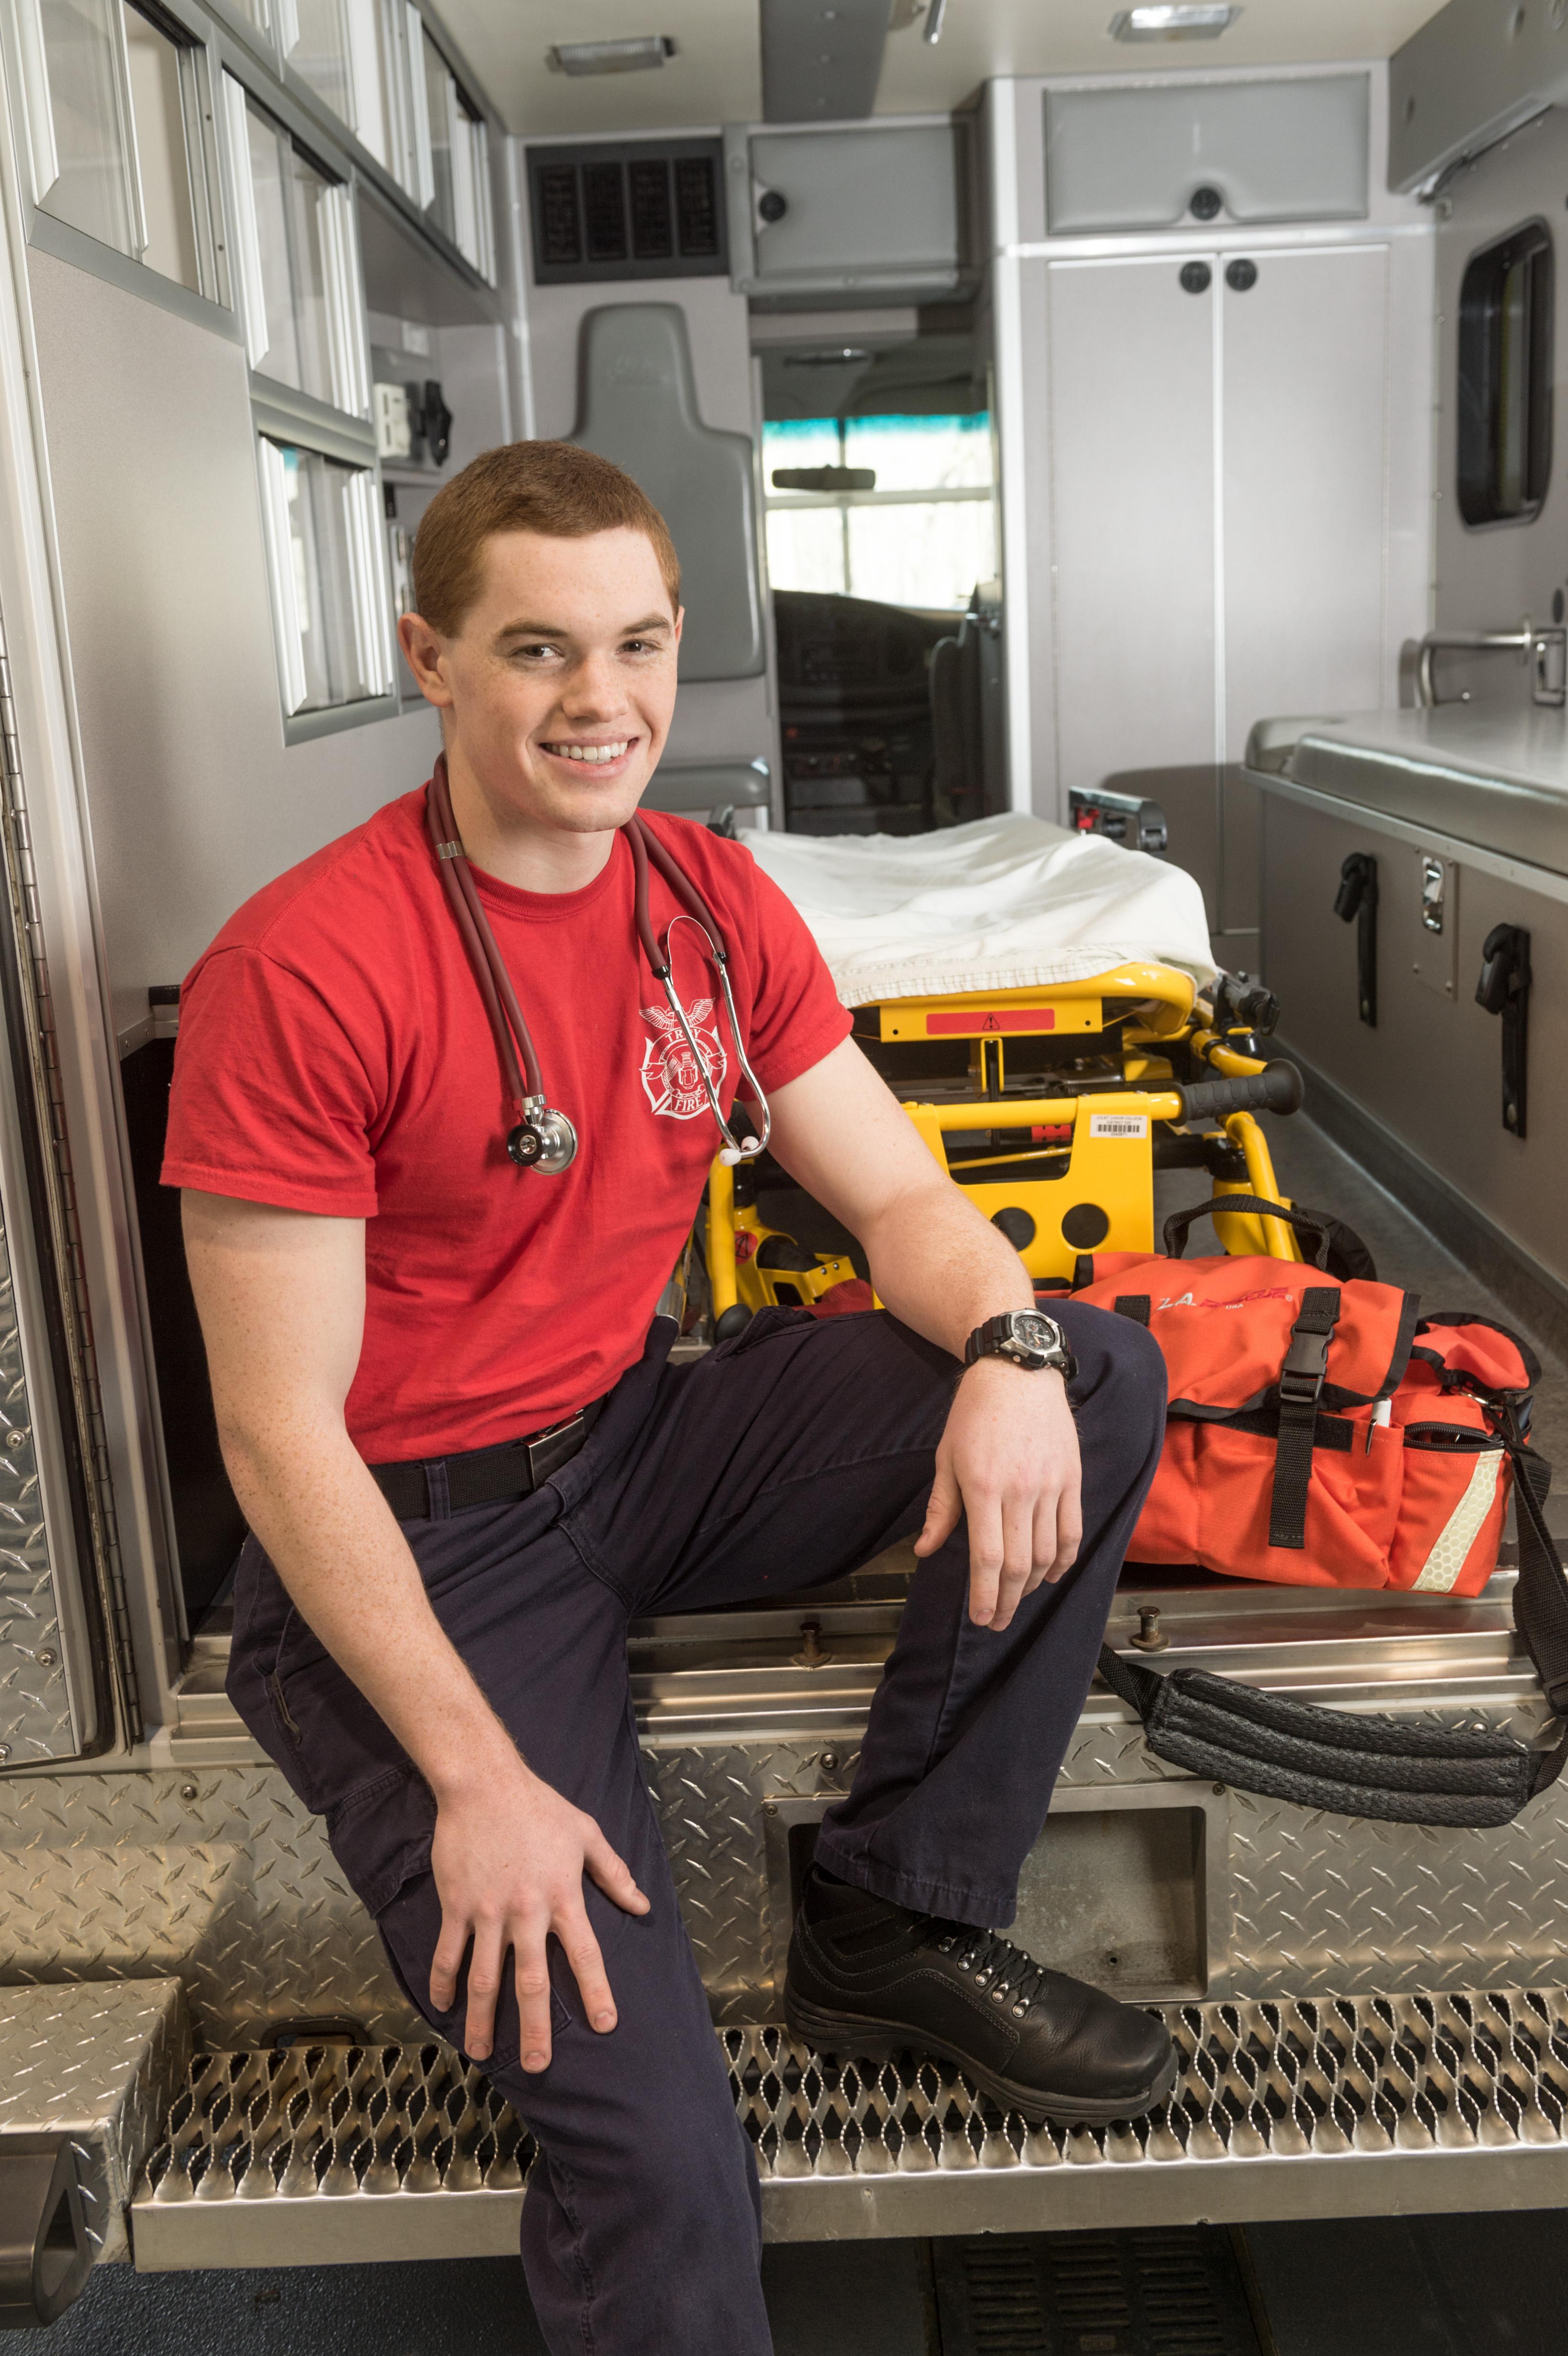 emt paramedic student.jpg